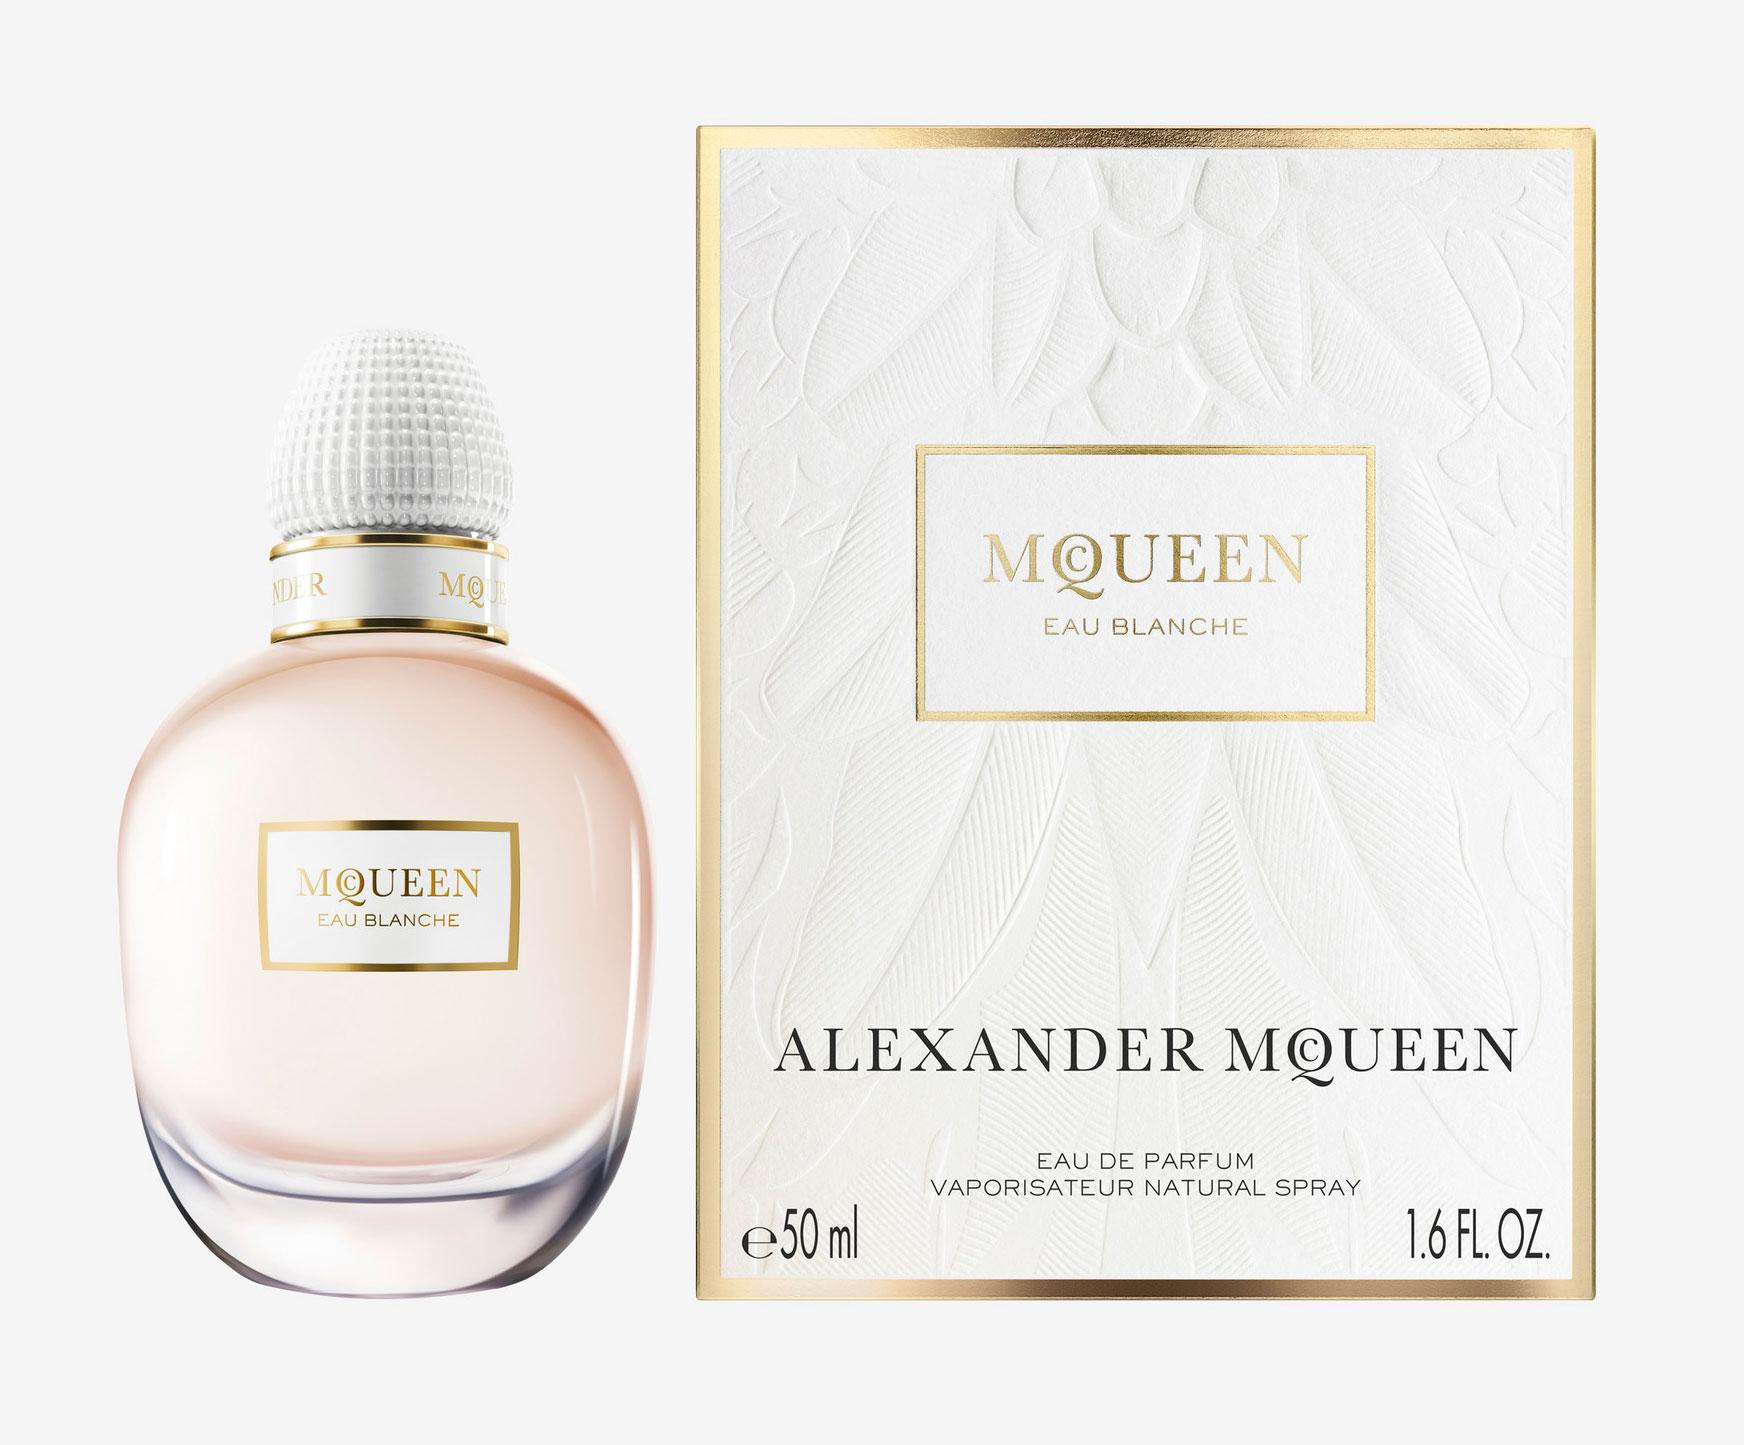 McQueen Eau Blanche packshot